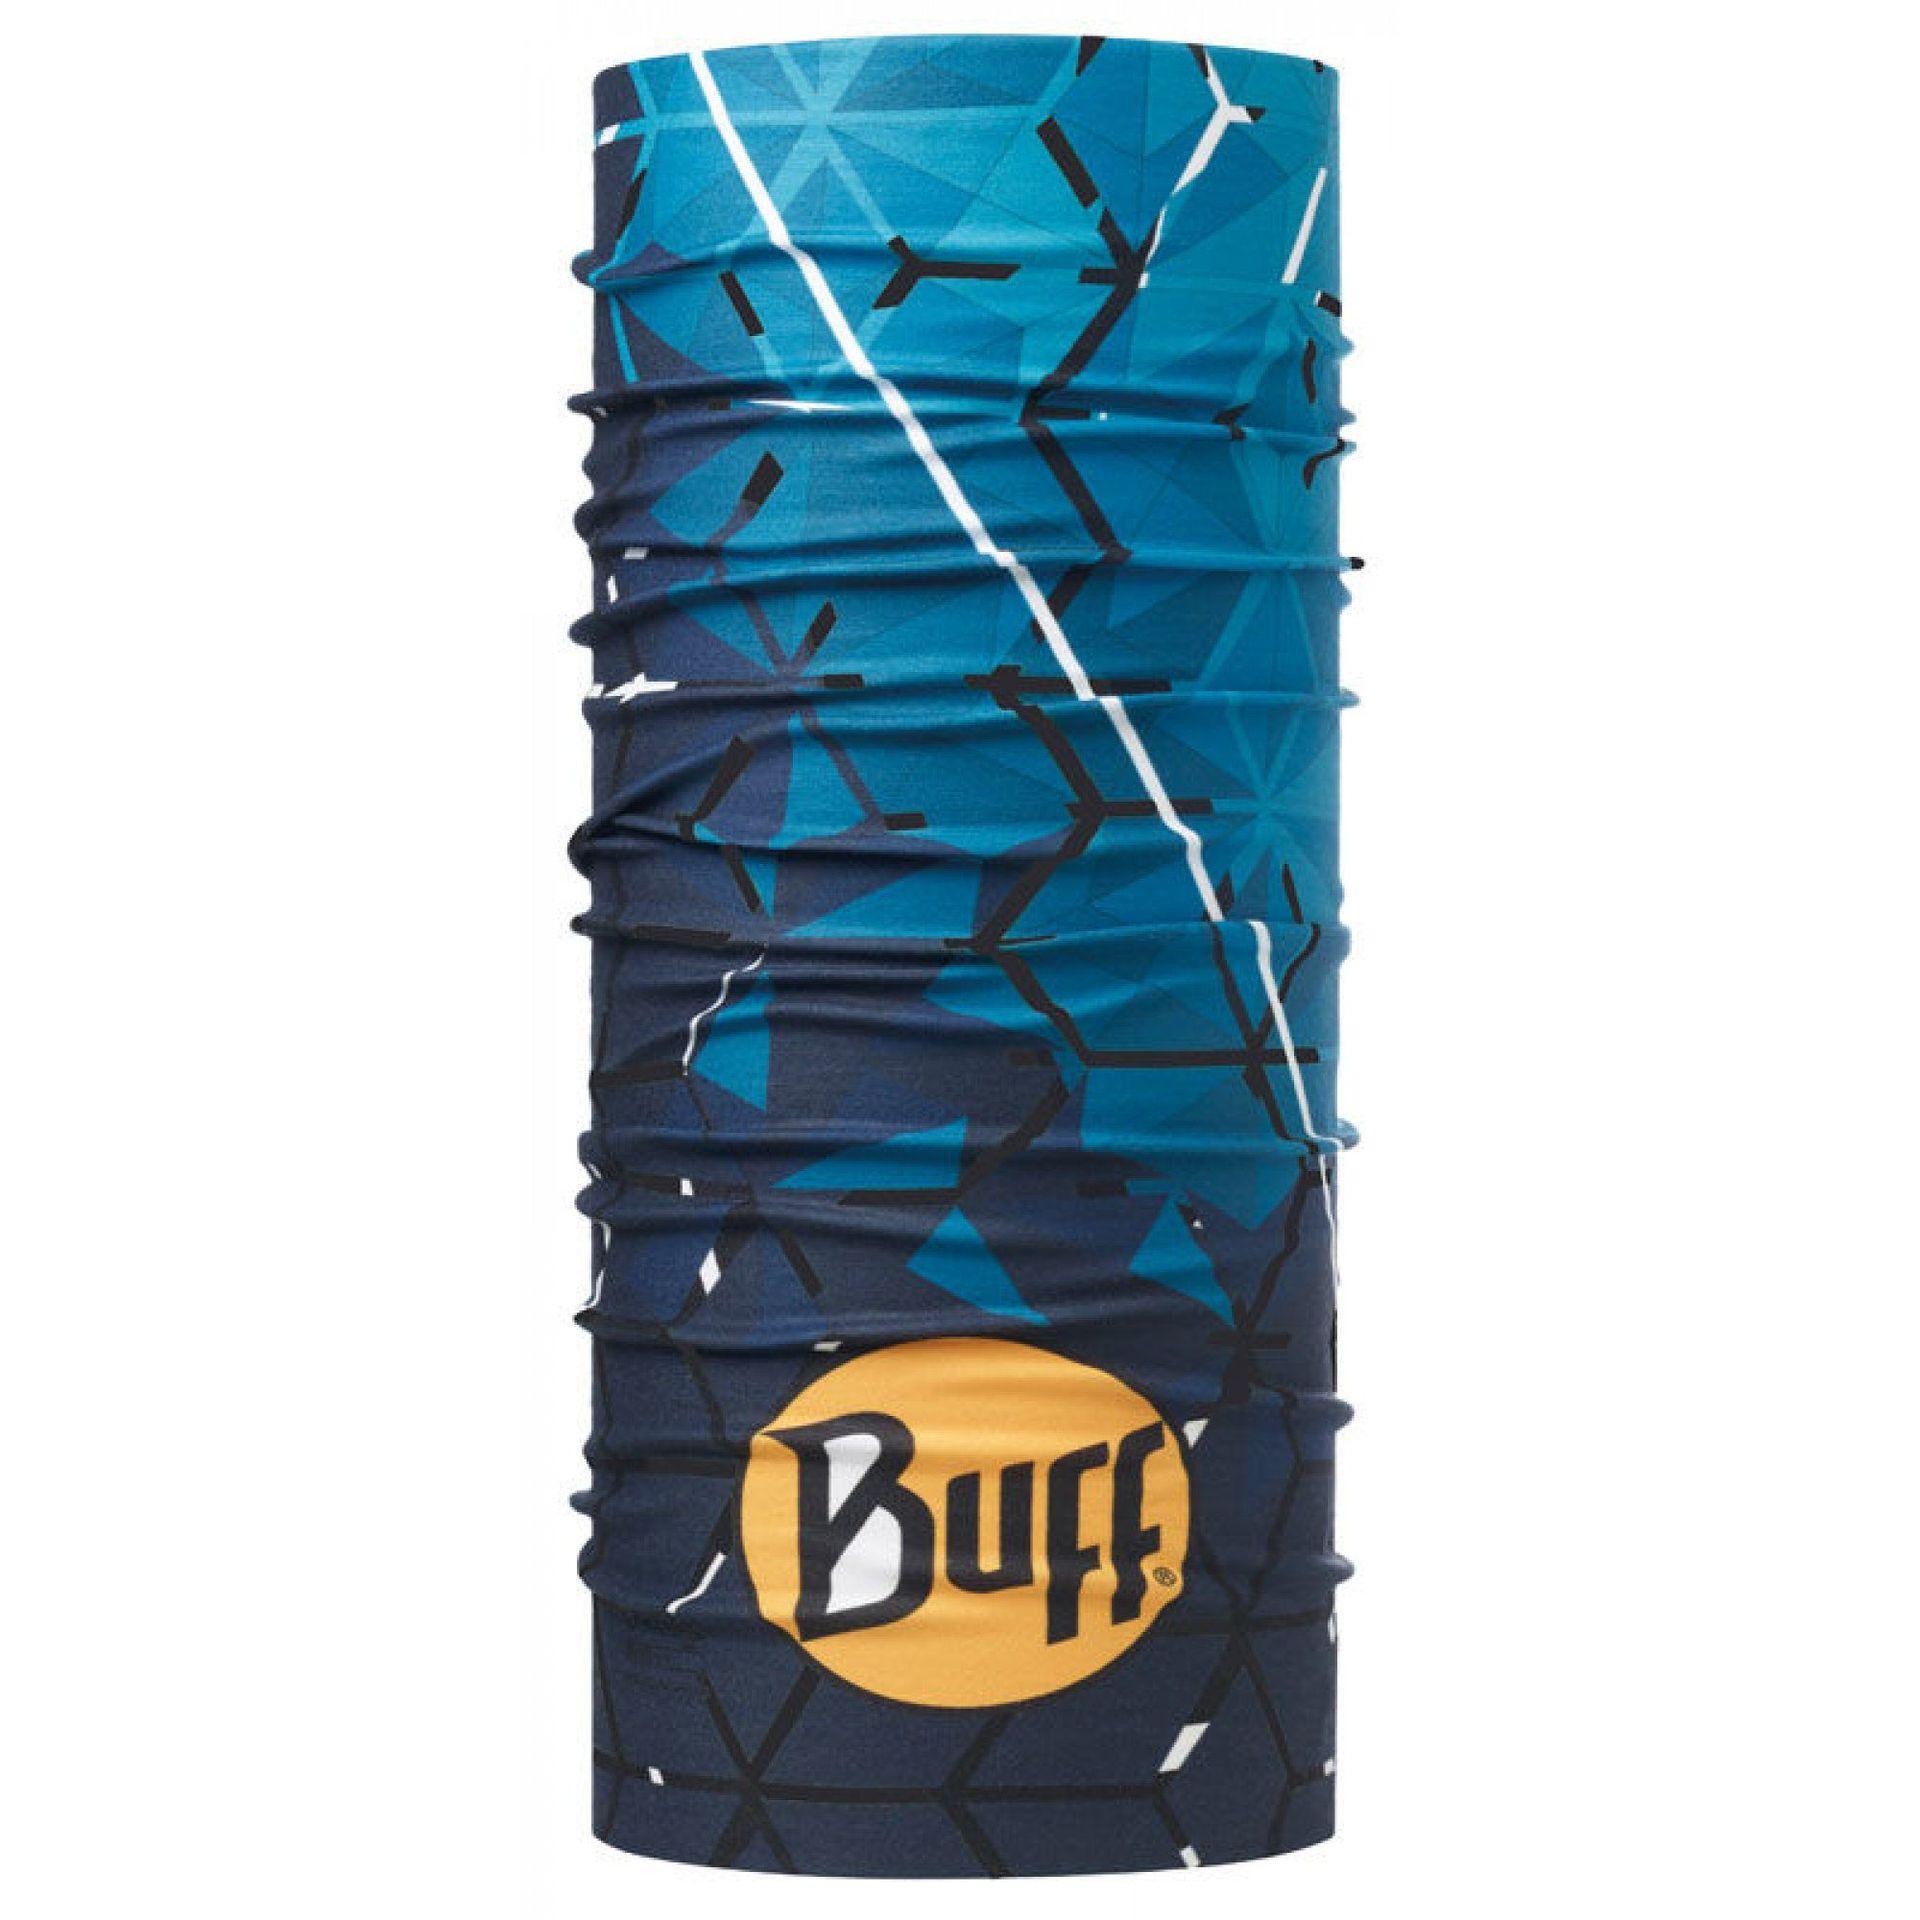 CHUSTA BUFF HIGH UV PROTECTION HELIX OCEAN BLUE